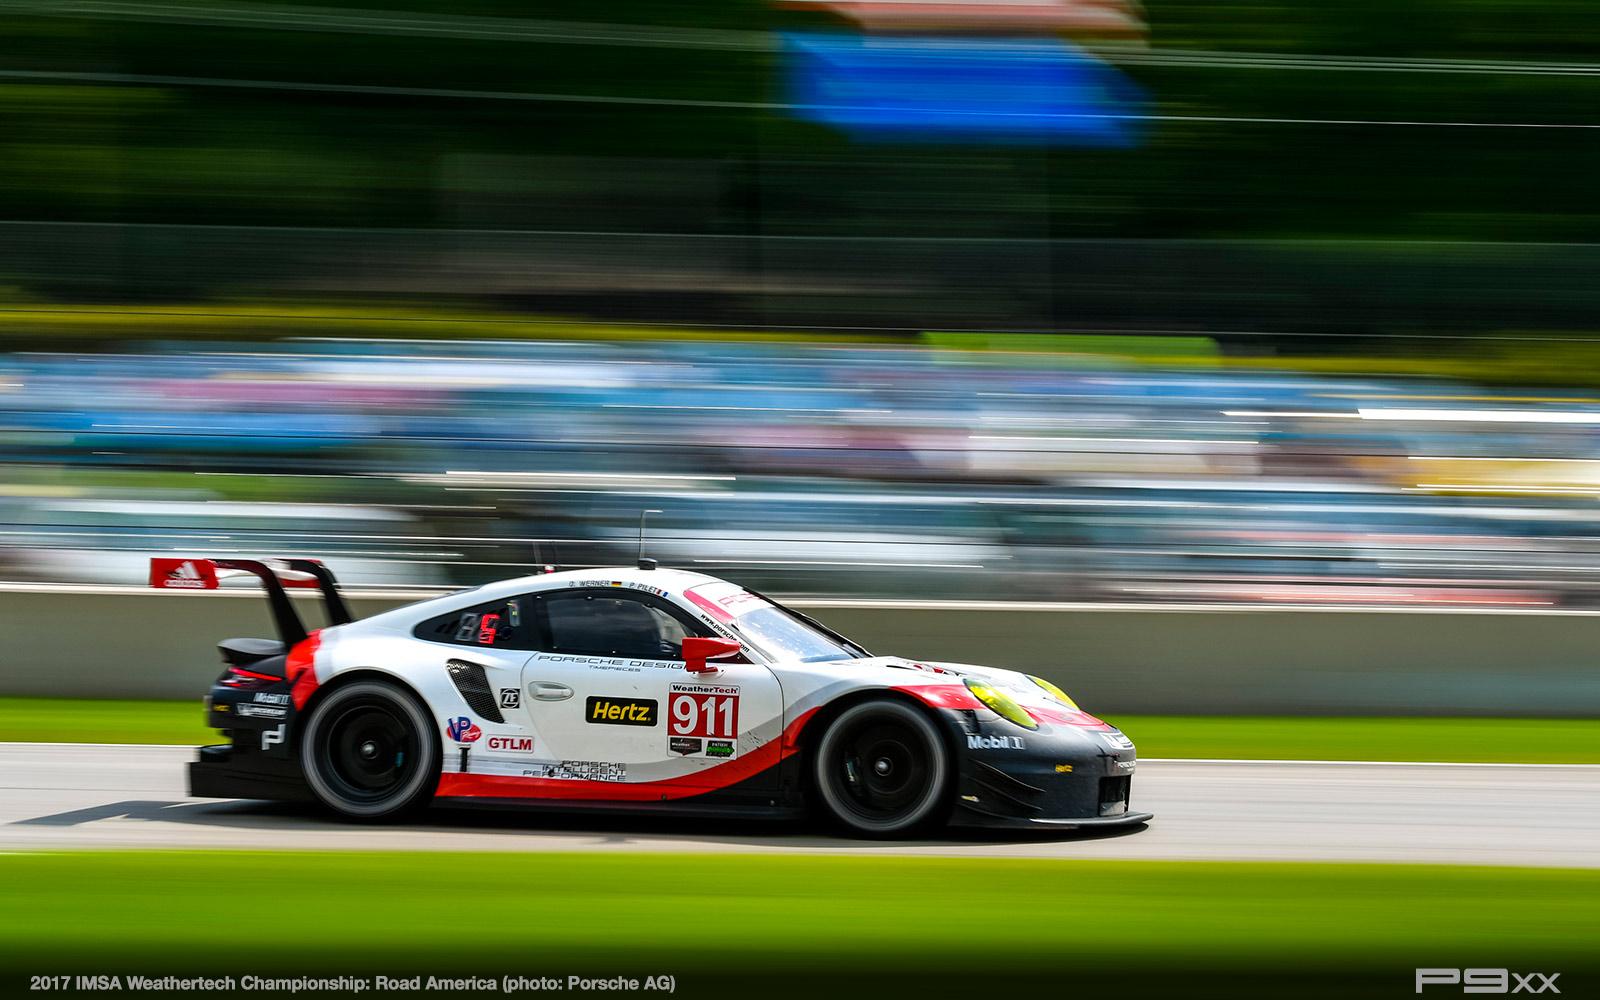 2017-IMSA-Weathertech-Road-America-Porsche-344